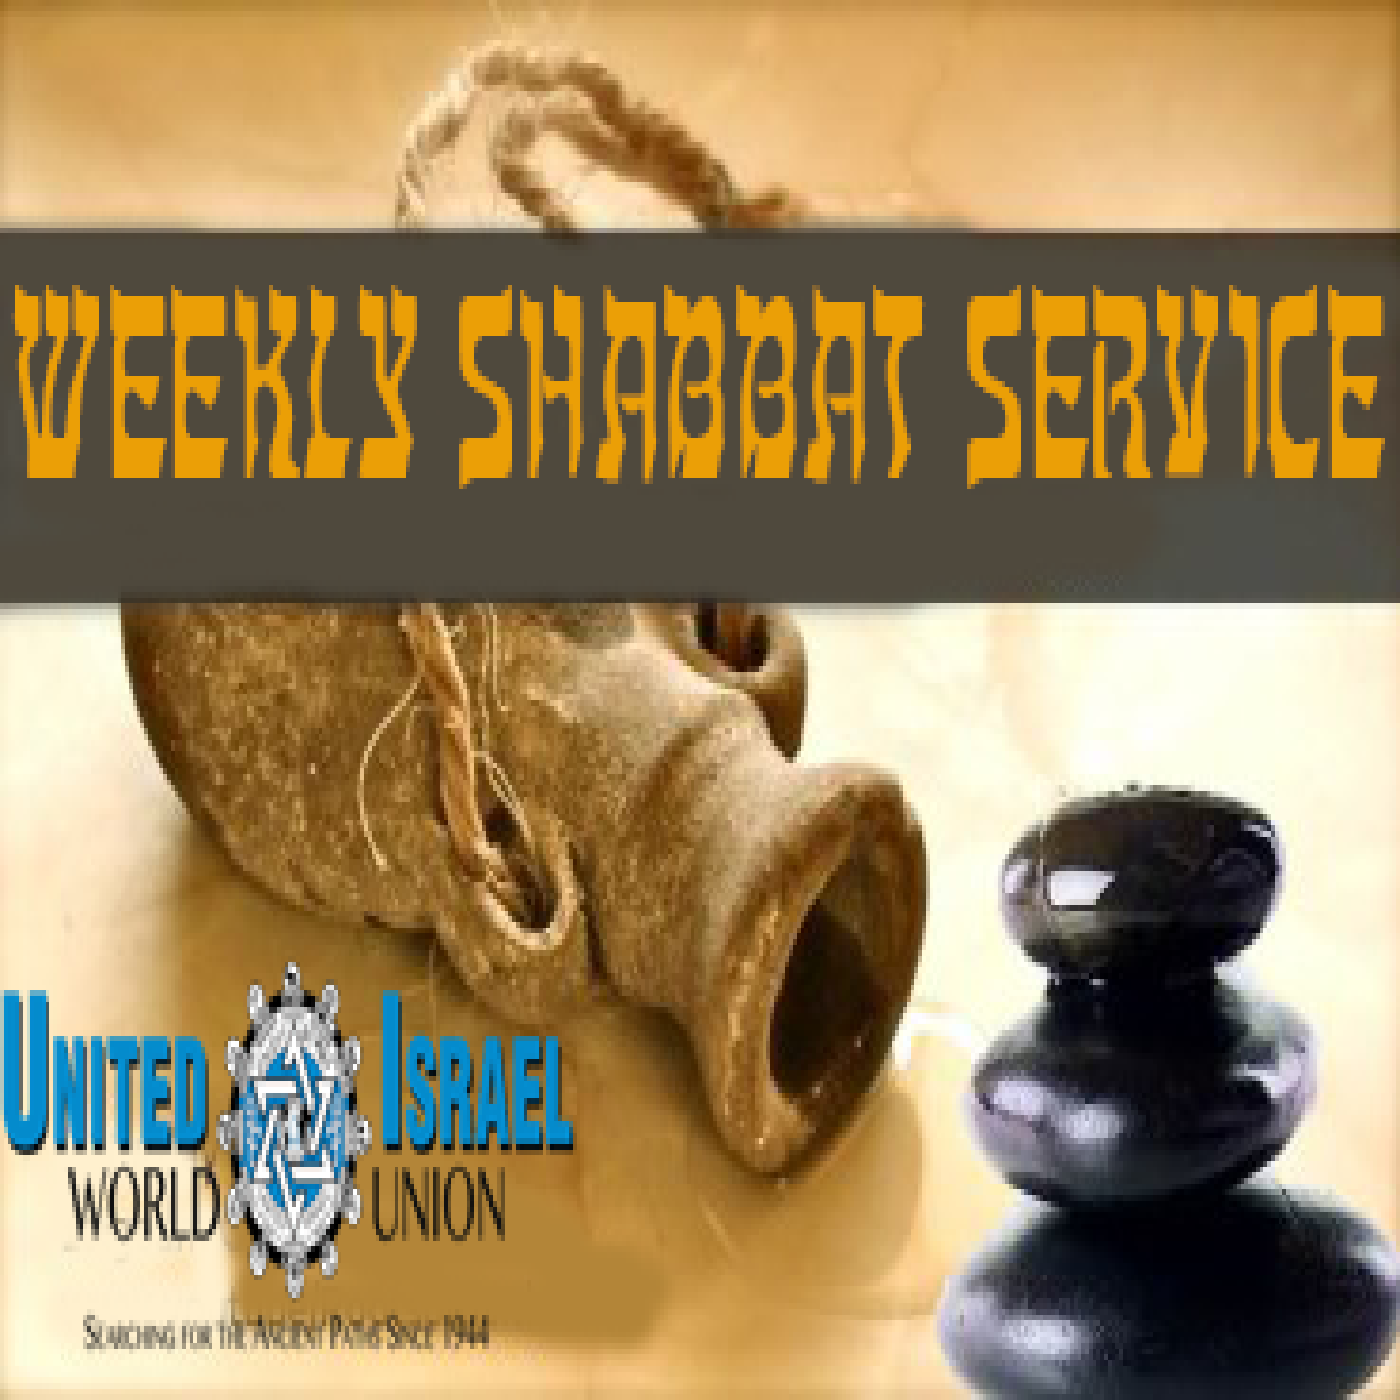 Artwork for Weekly Torah Sabbath Teaching Saturday, October 14th.Genesis 41:1-37 with Ross Nichols